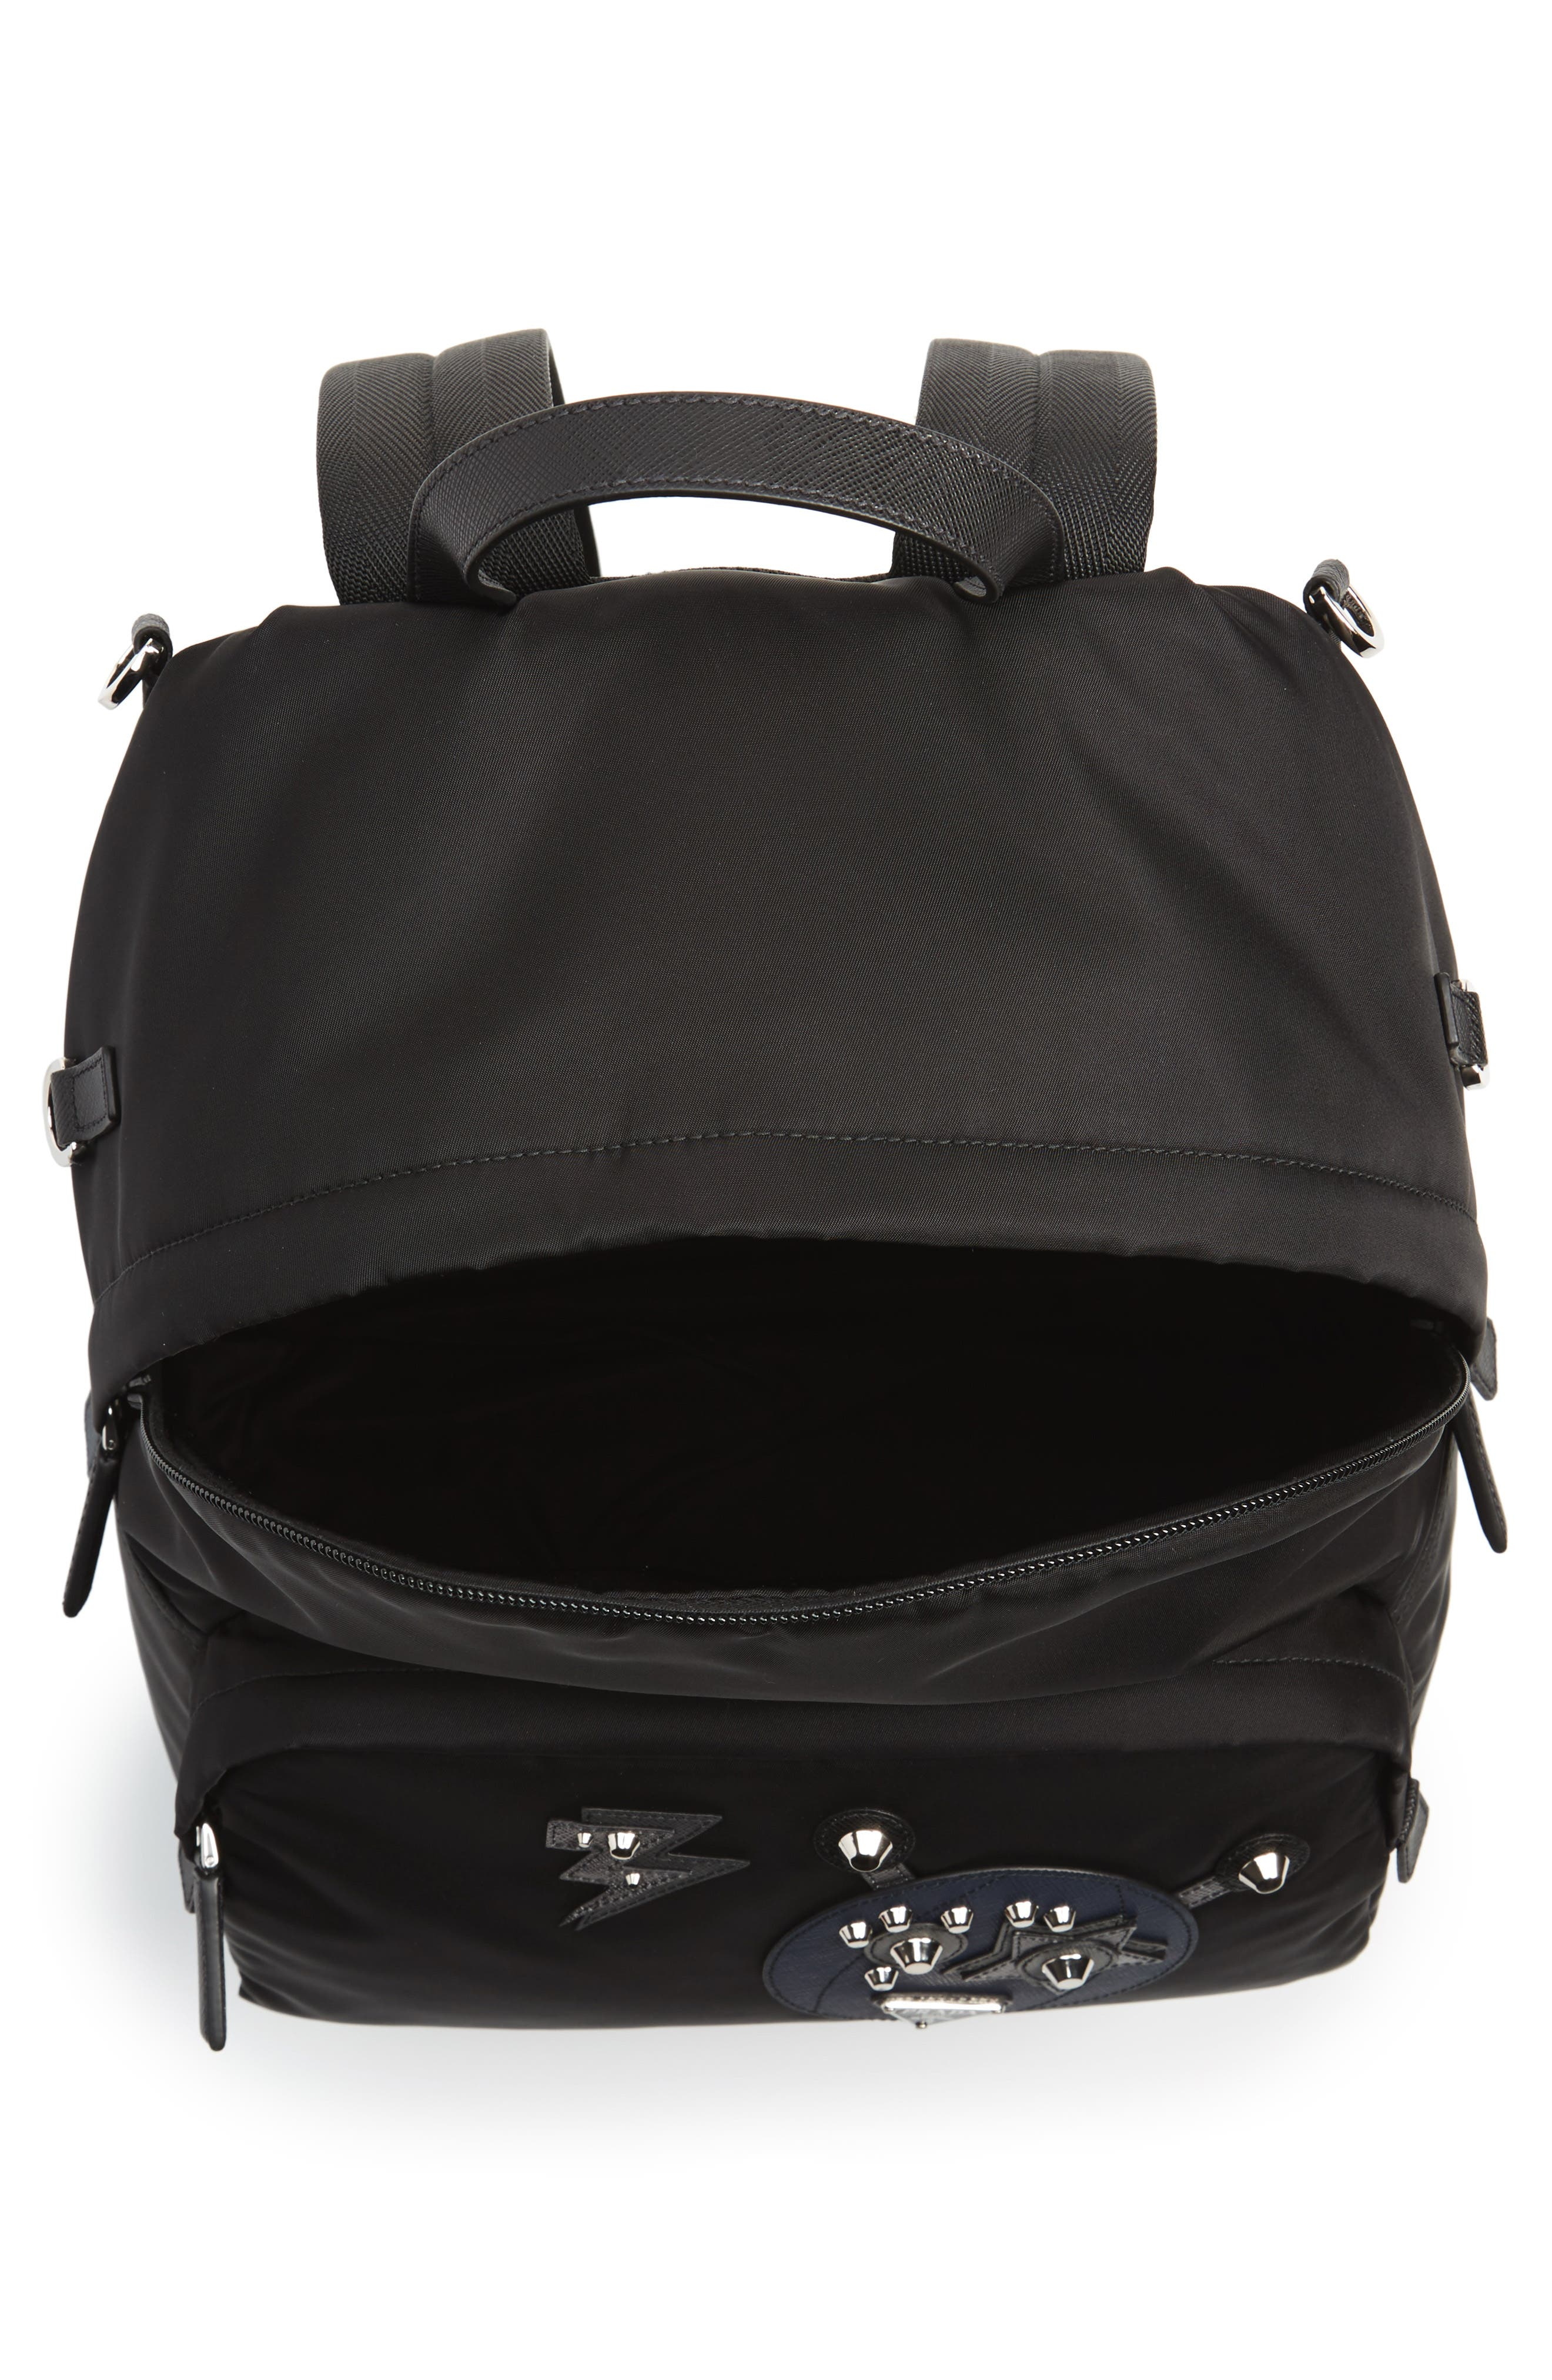 Robot Backpack,                             Alternate thumbnail 5, color,                             F0g52 Nero+Baltic